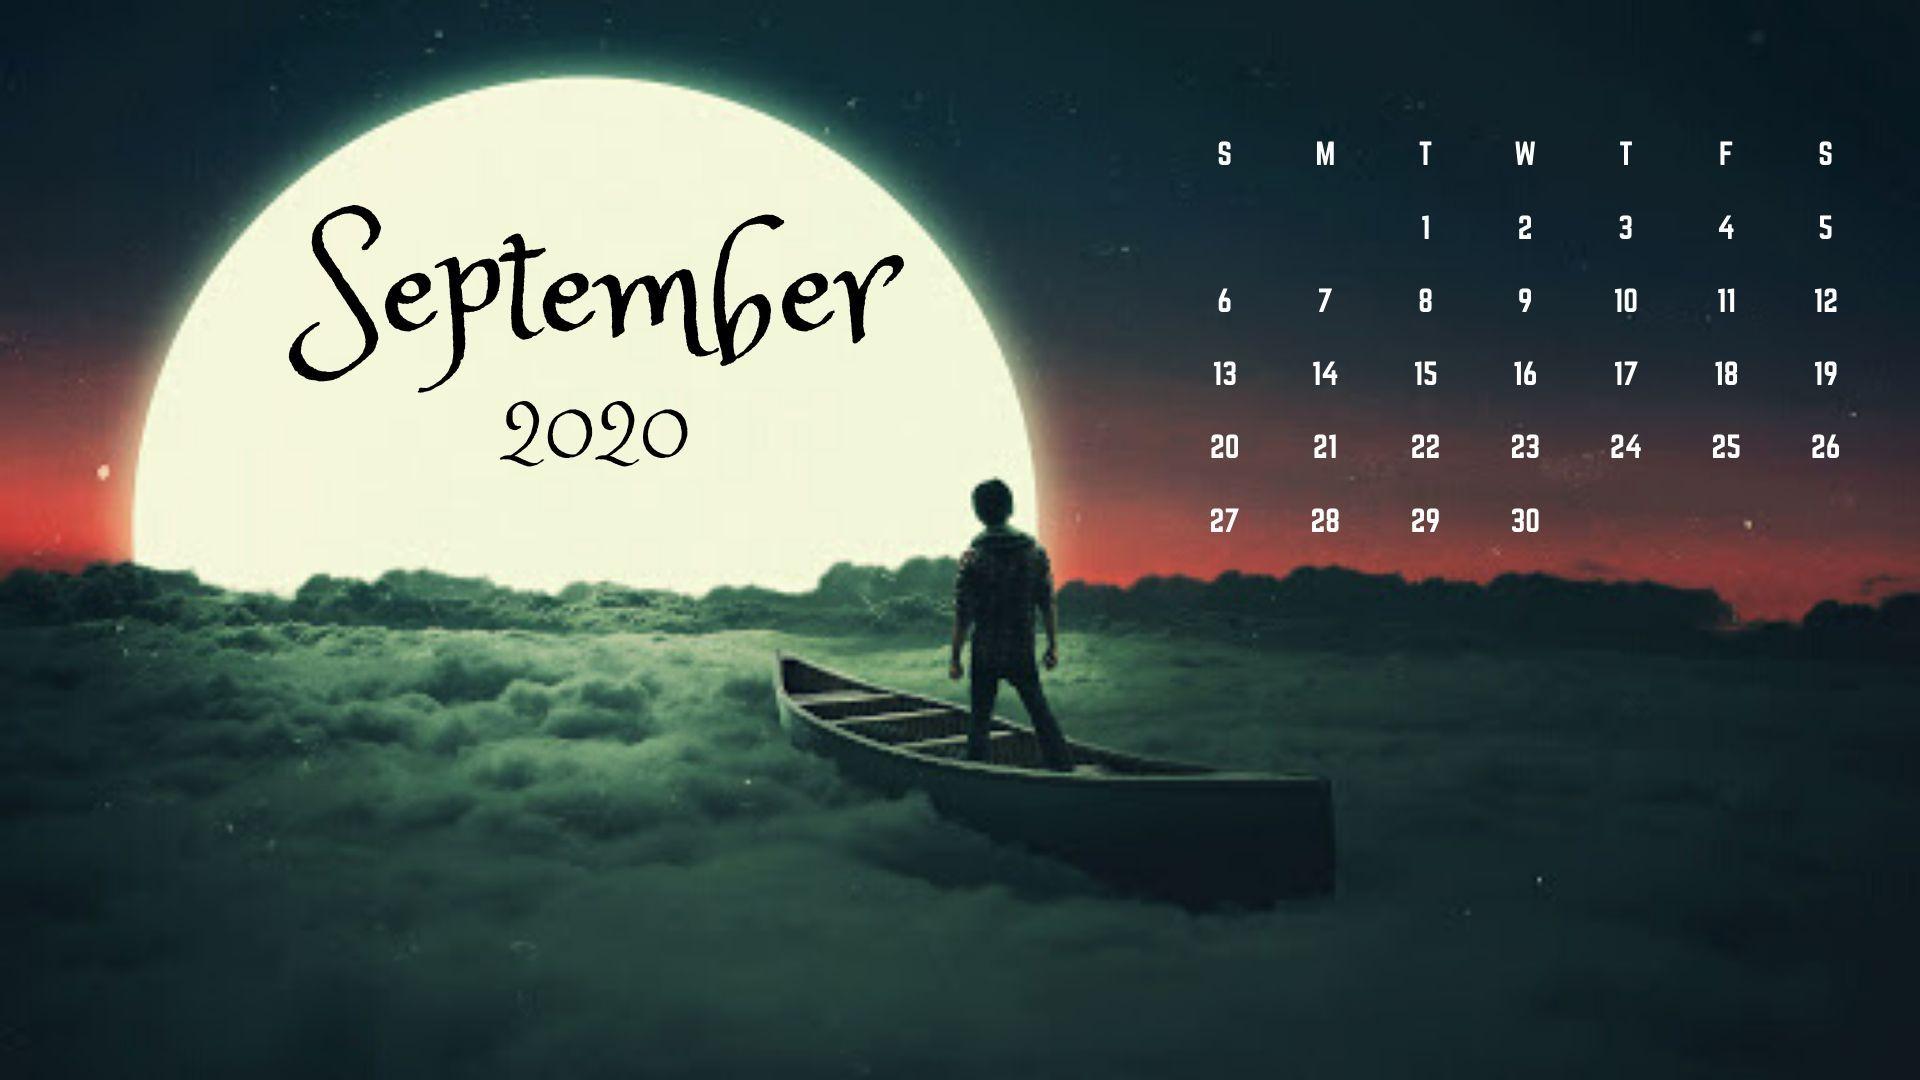 September 2020 Desktop Calendar Wallpapers Download Calendarbuzz In 2020 Calendar Wallpaper Desktop Calendar Hd Cool Wallpapers